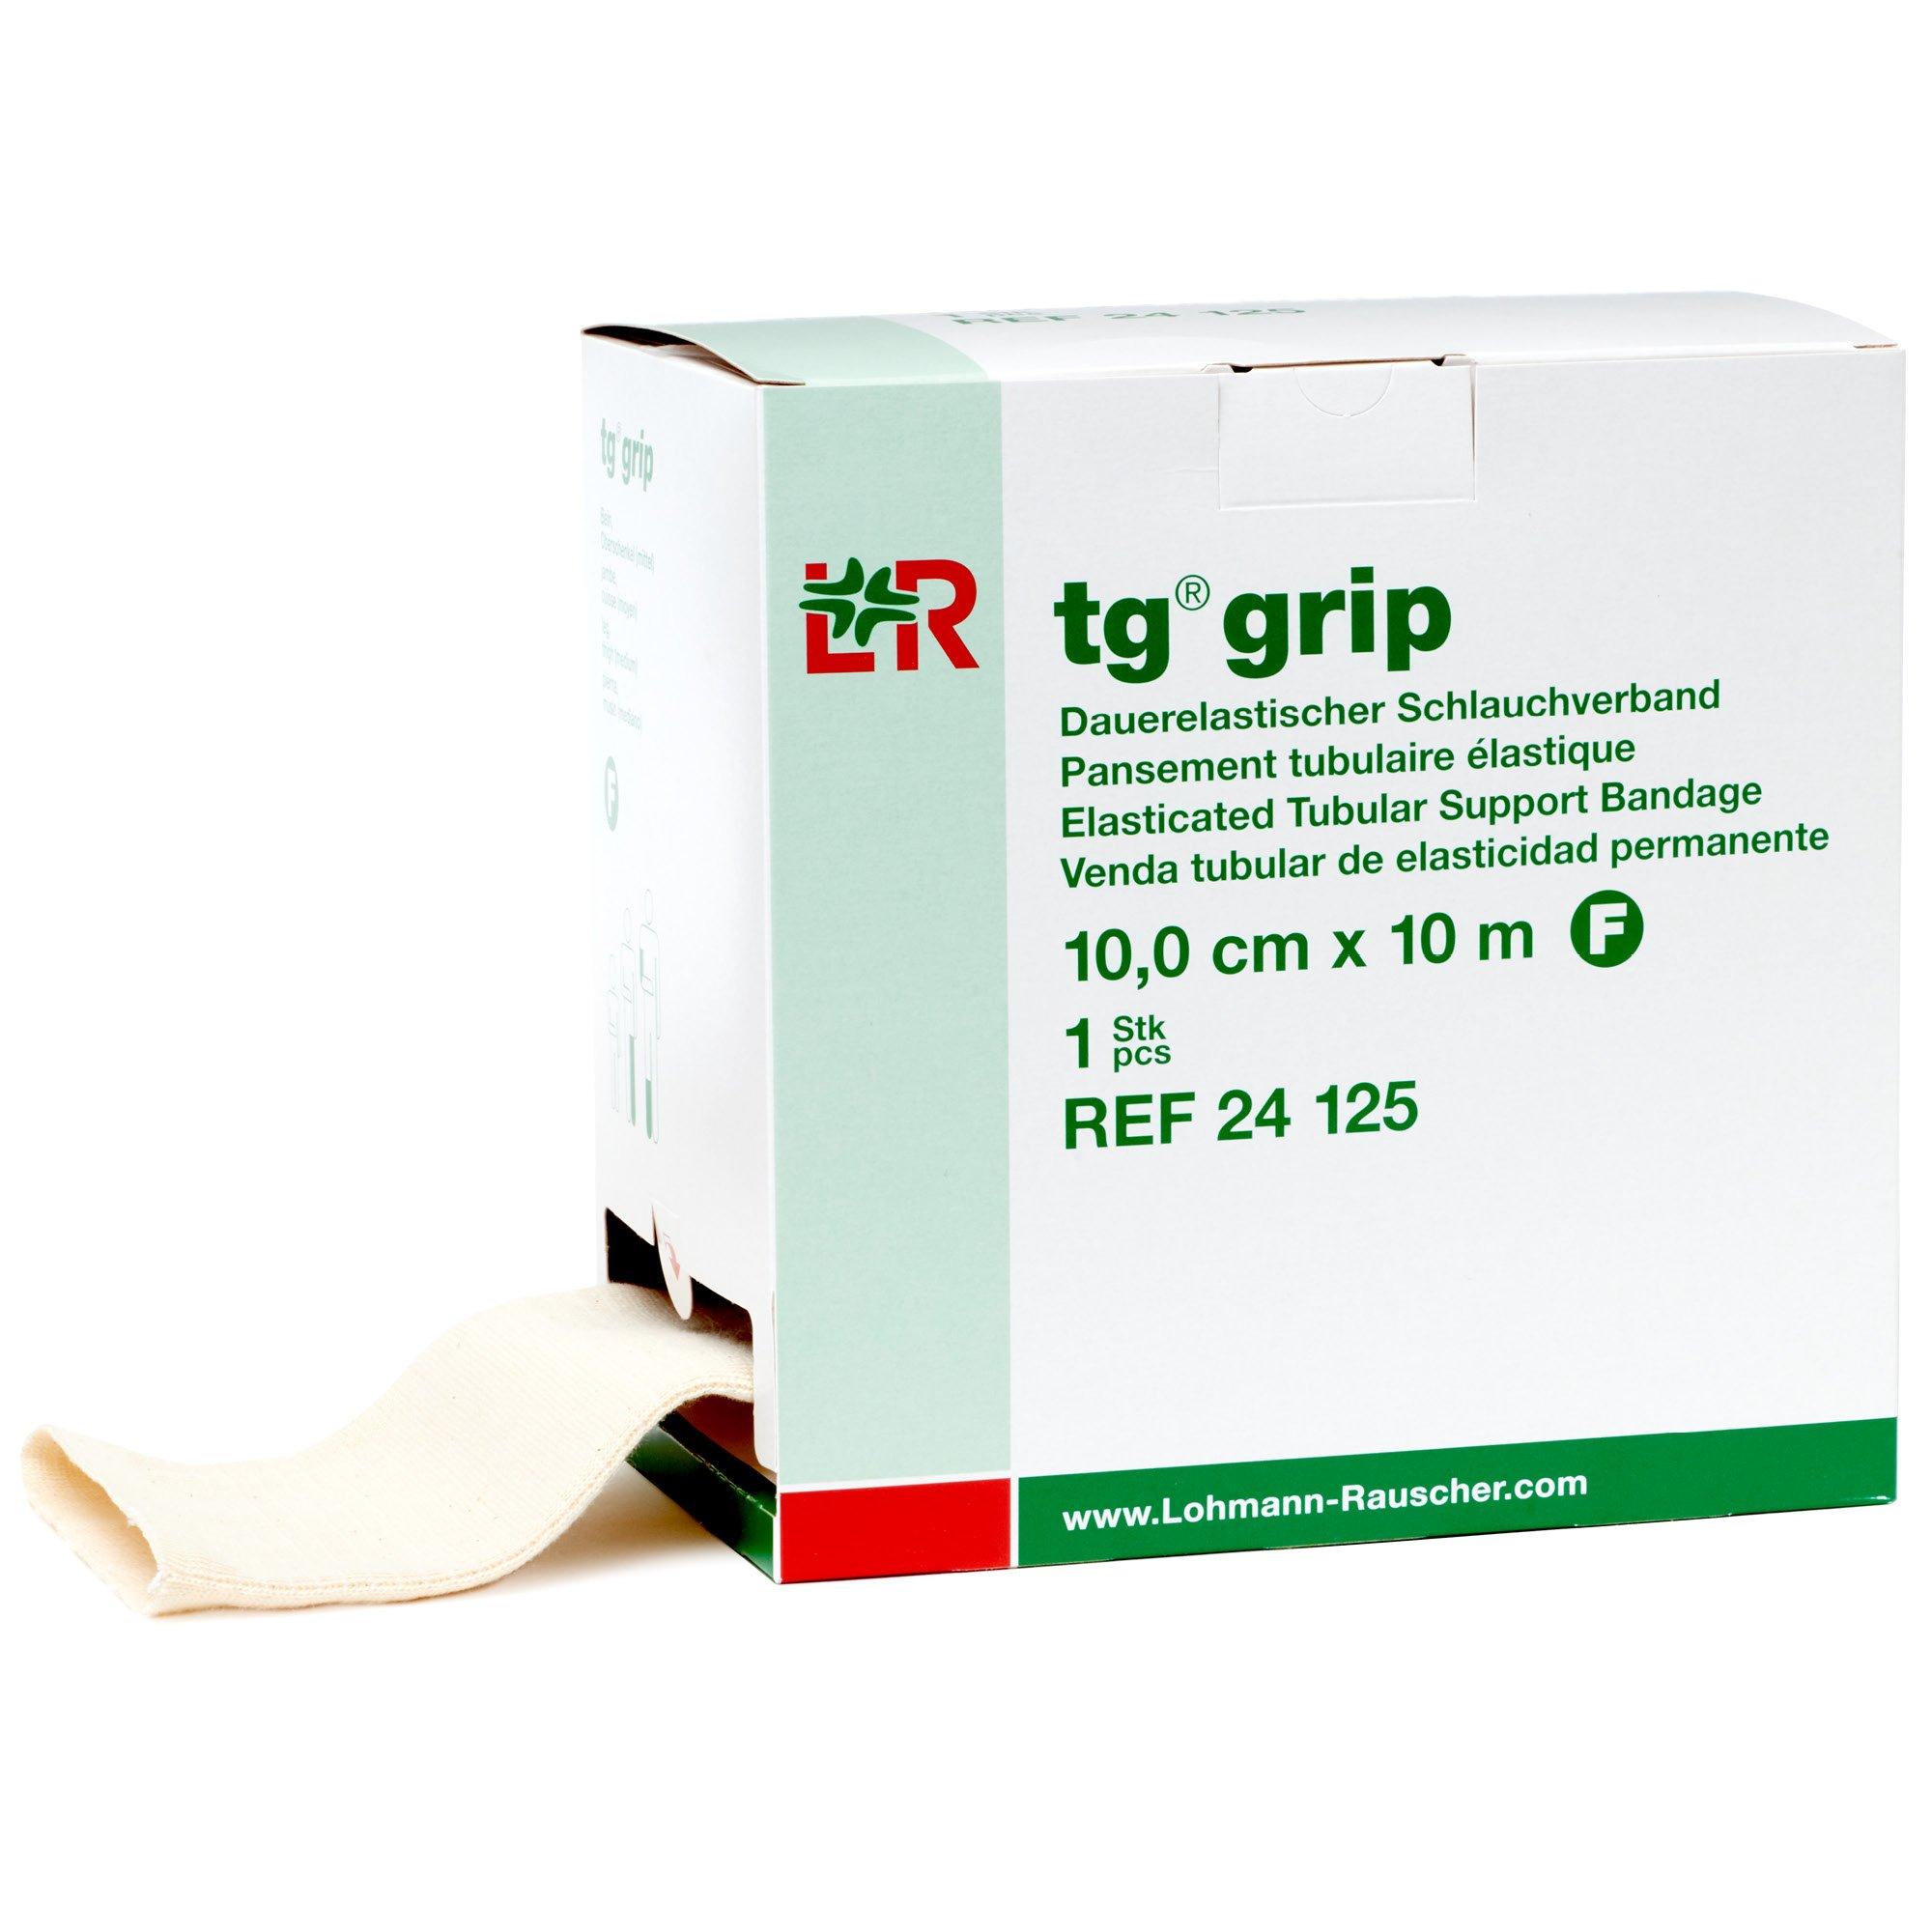 tg Grip Elastic Tubular Compression Bandage, Seamless Tube Stockinette Wrap for Retention, Lymphedema, Swelling, 85% Cotton, Washable & Reusable, Size F